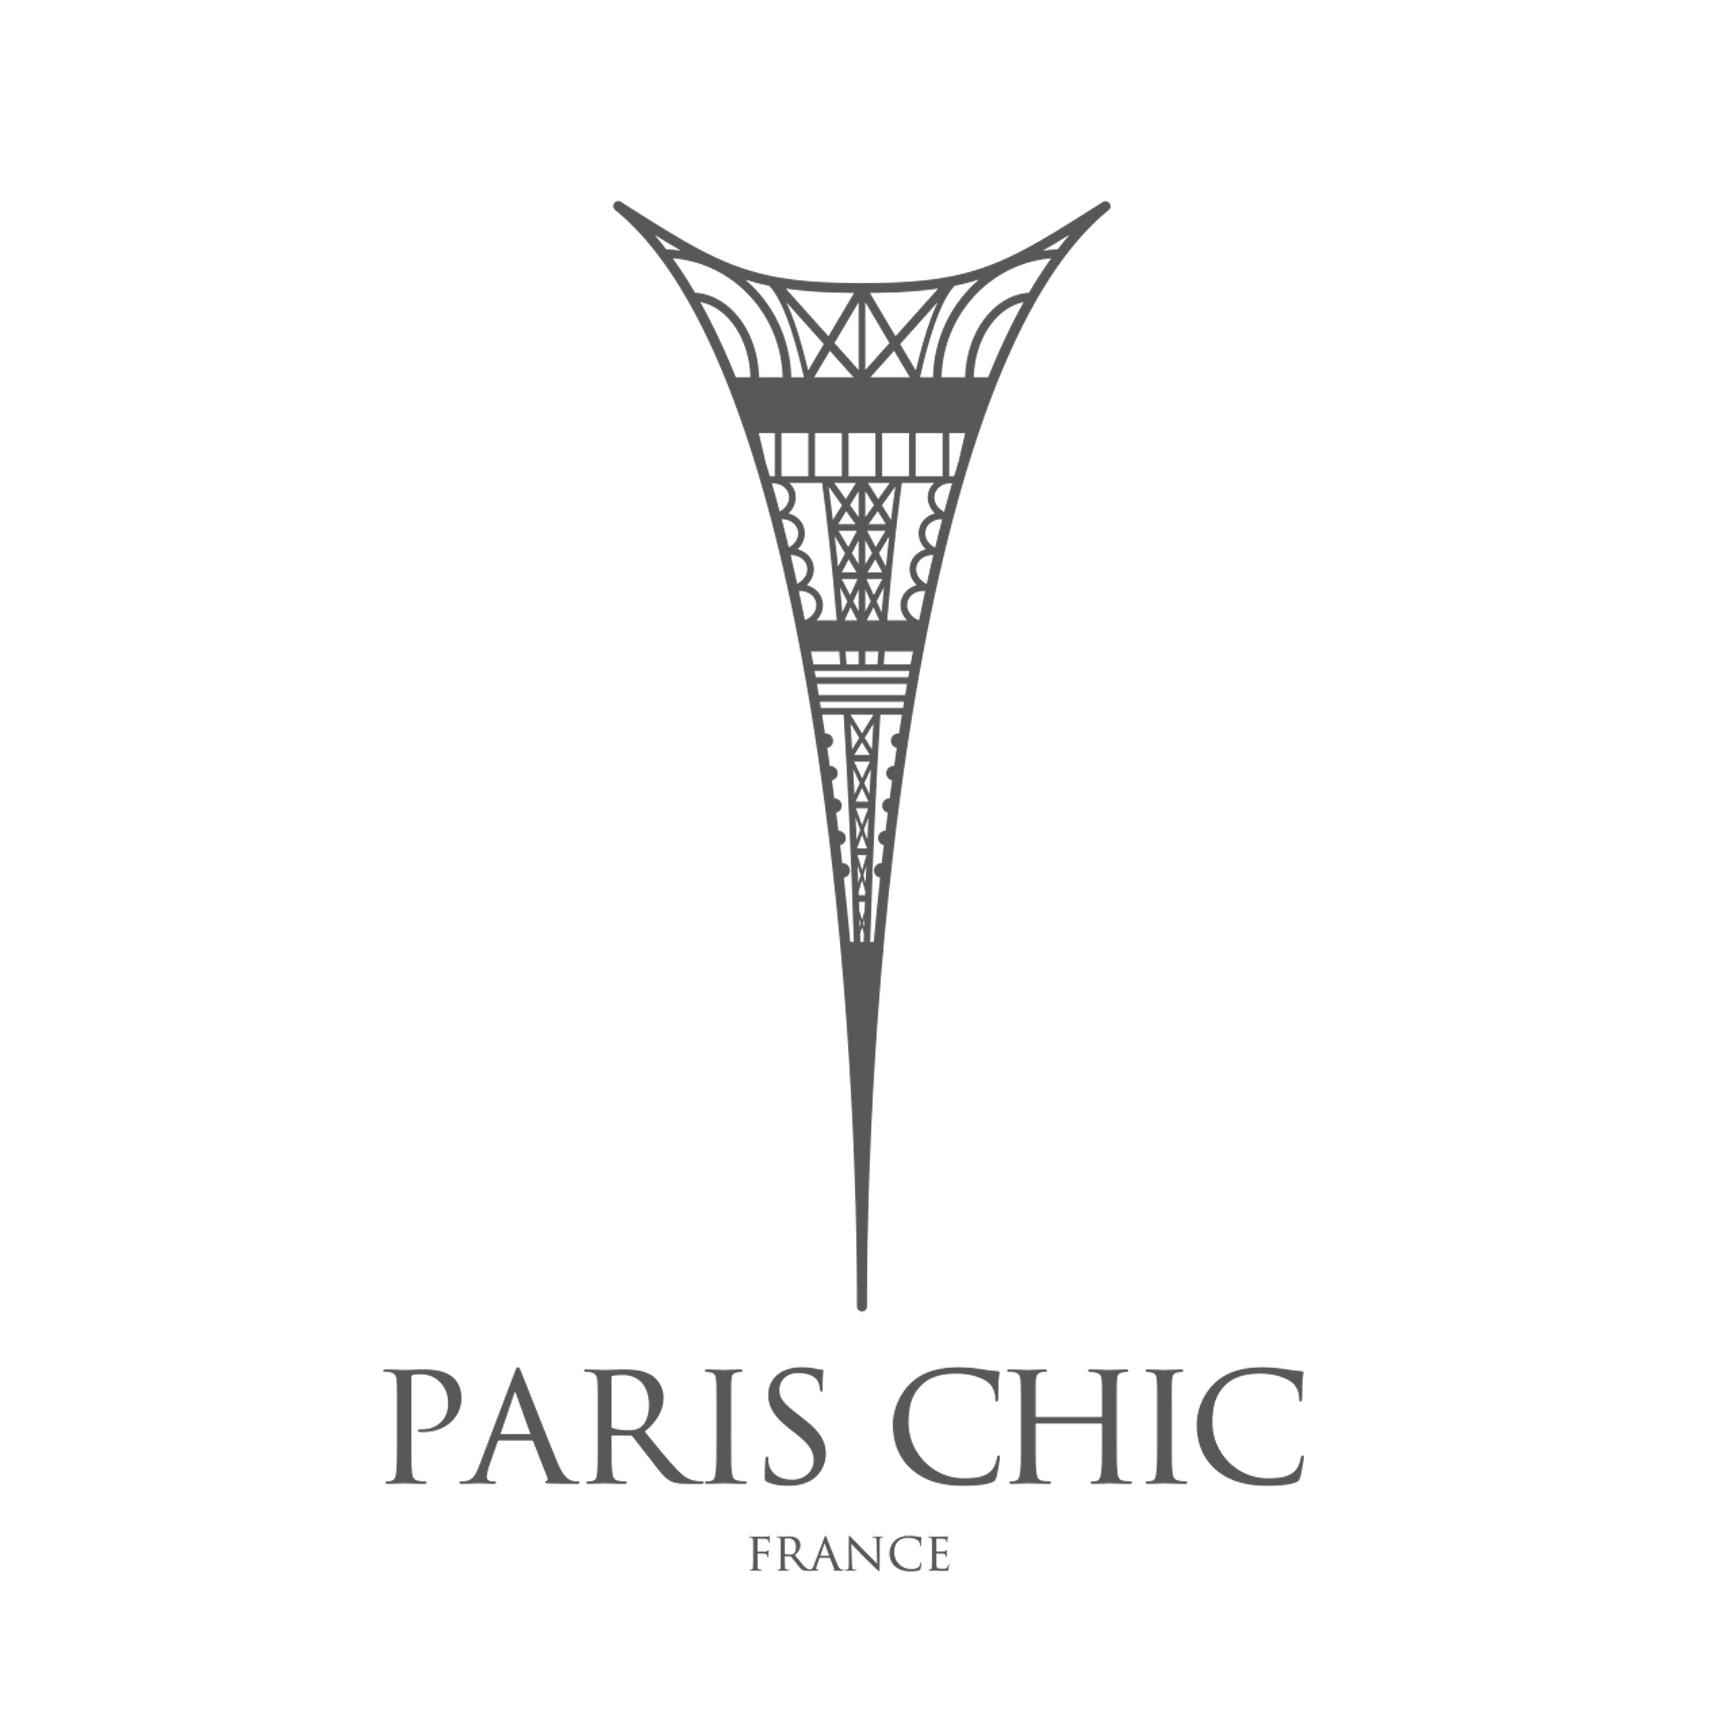 paris-chic-logo.jpg